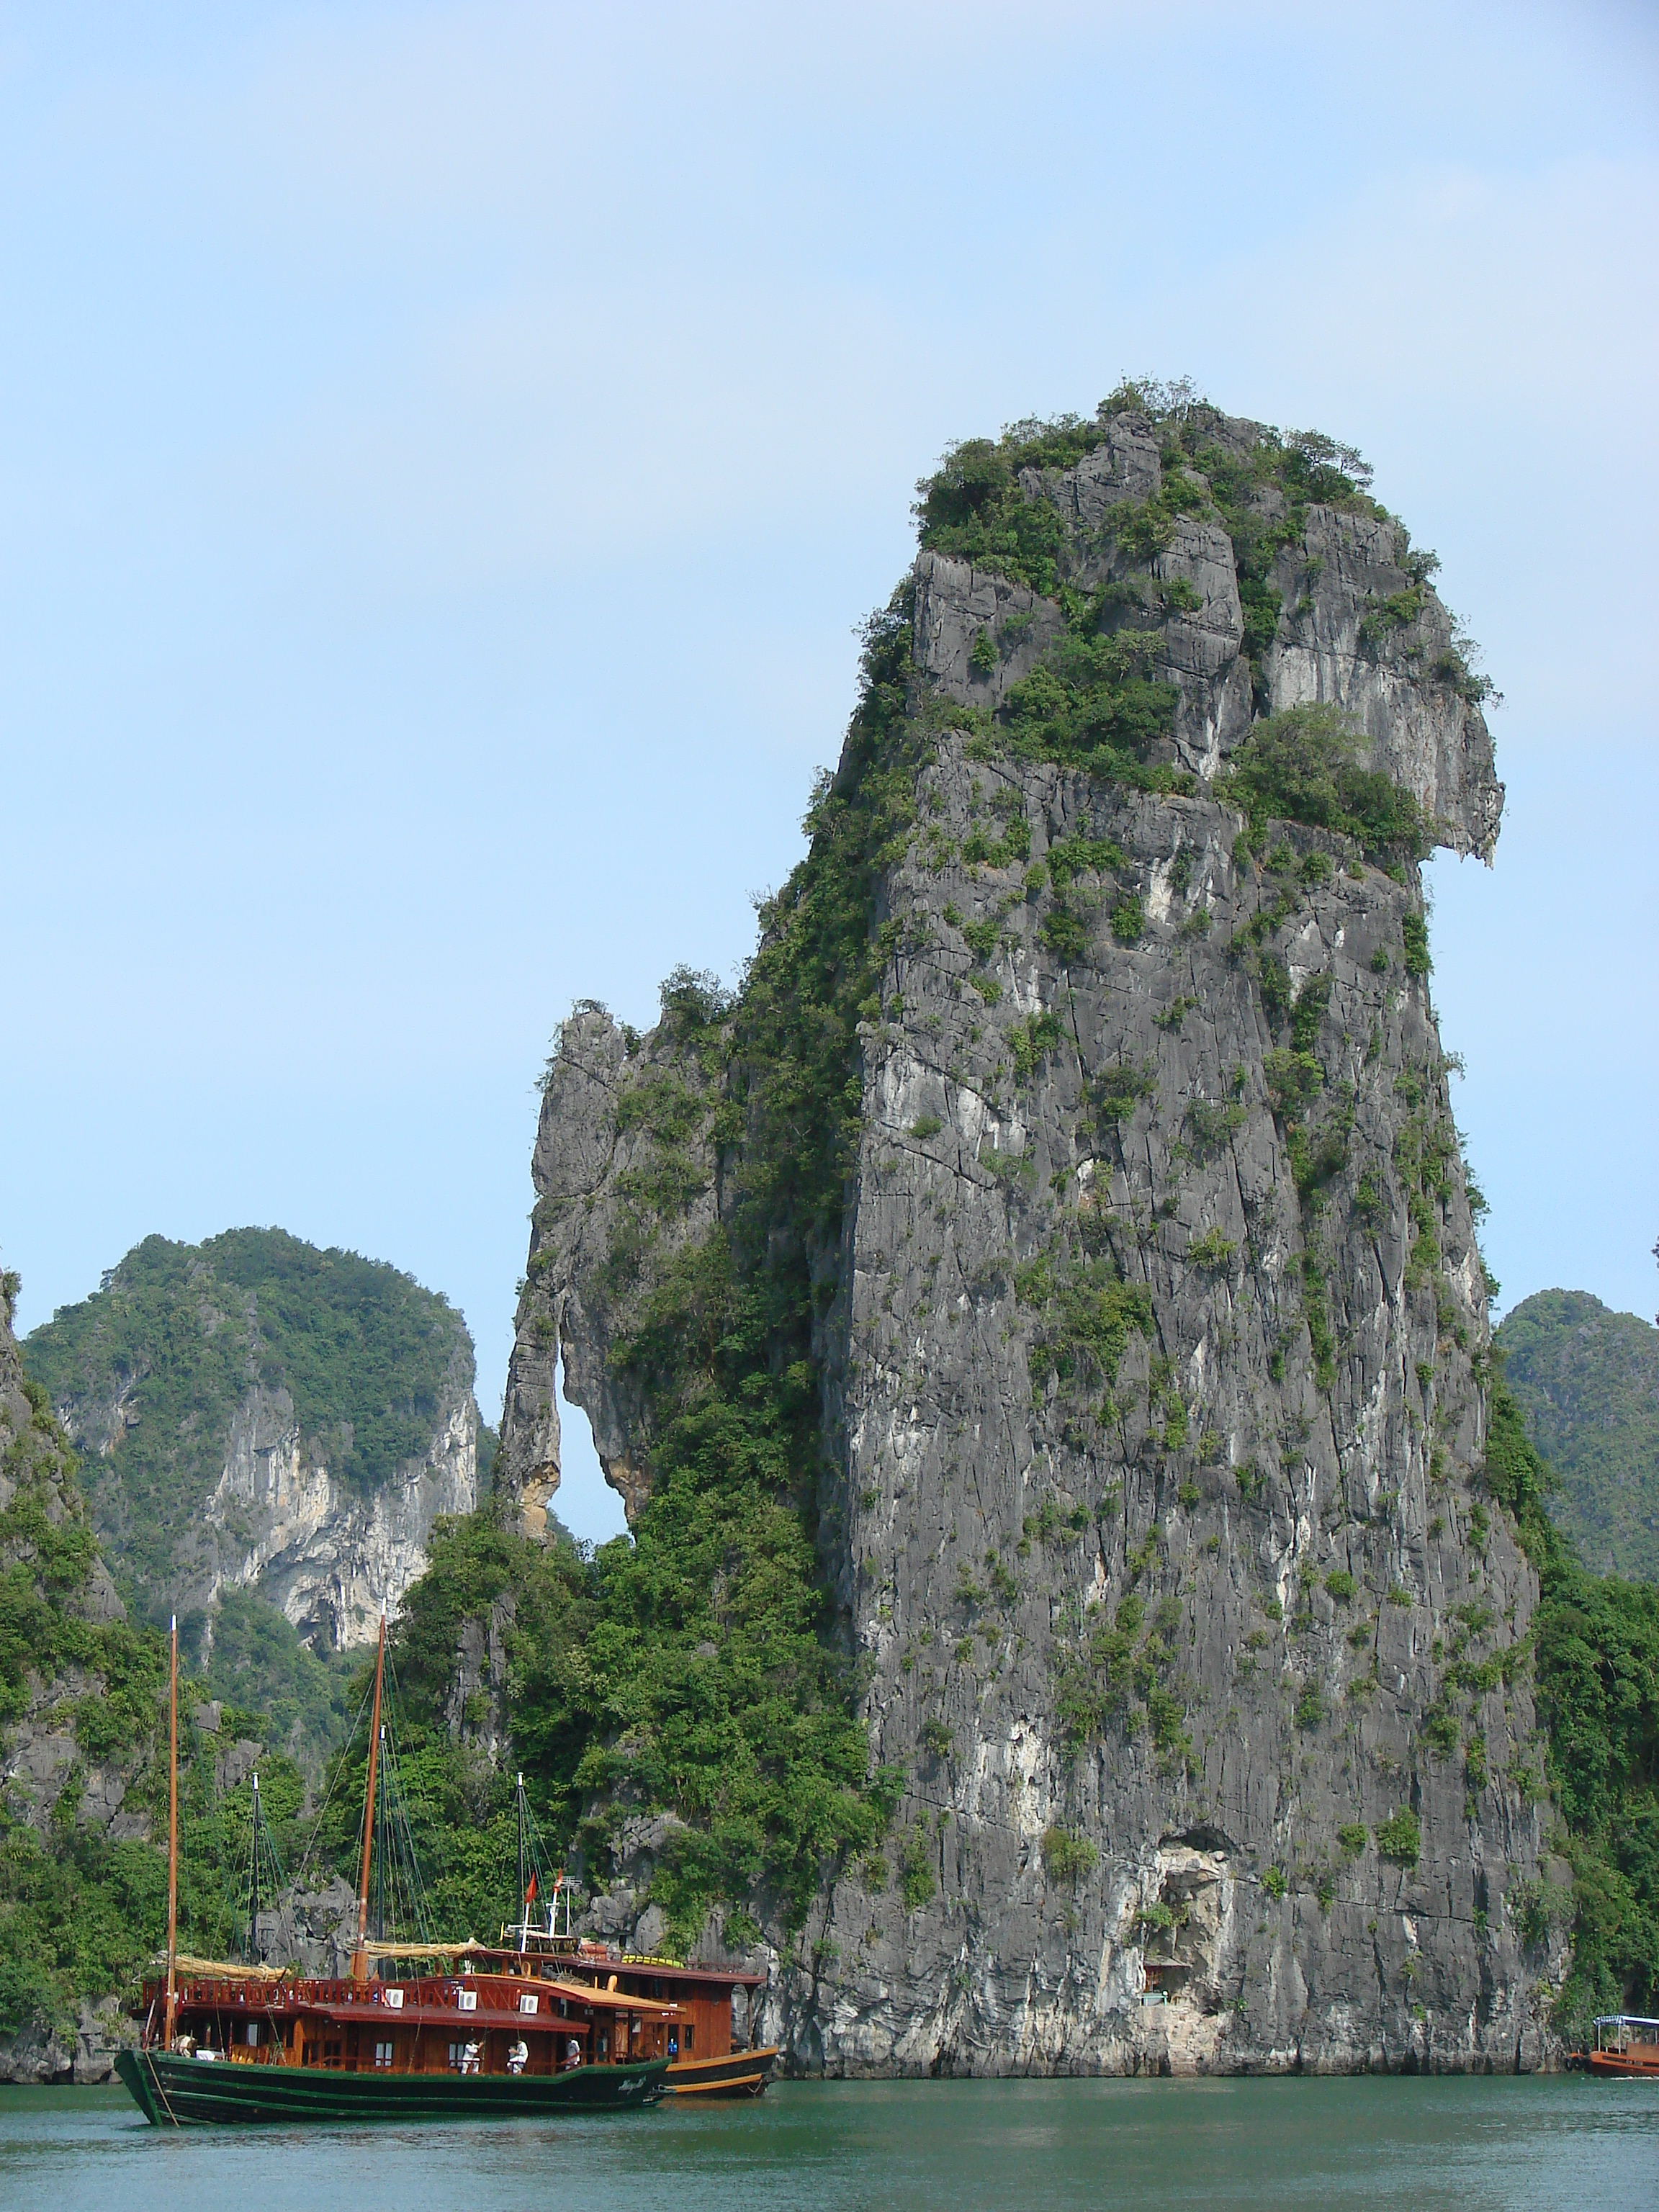 Halong Vietnam  city photos gallery : Description Halong Bay Vietnam 02